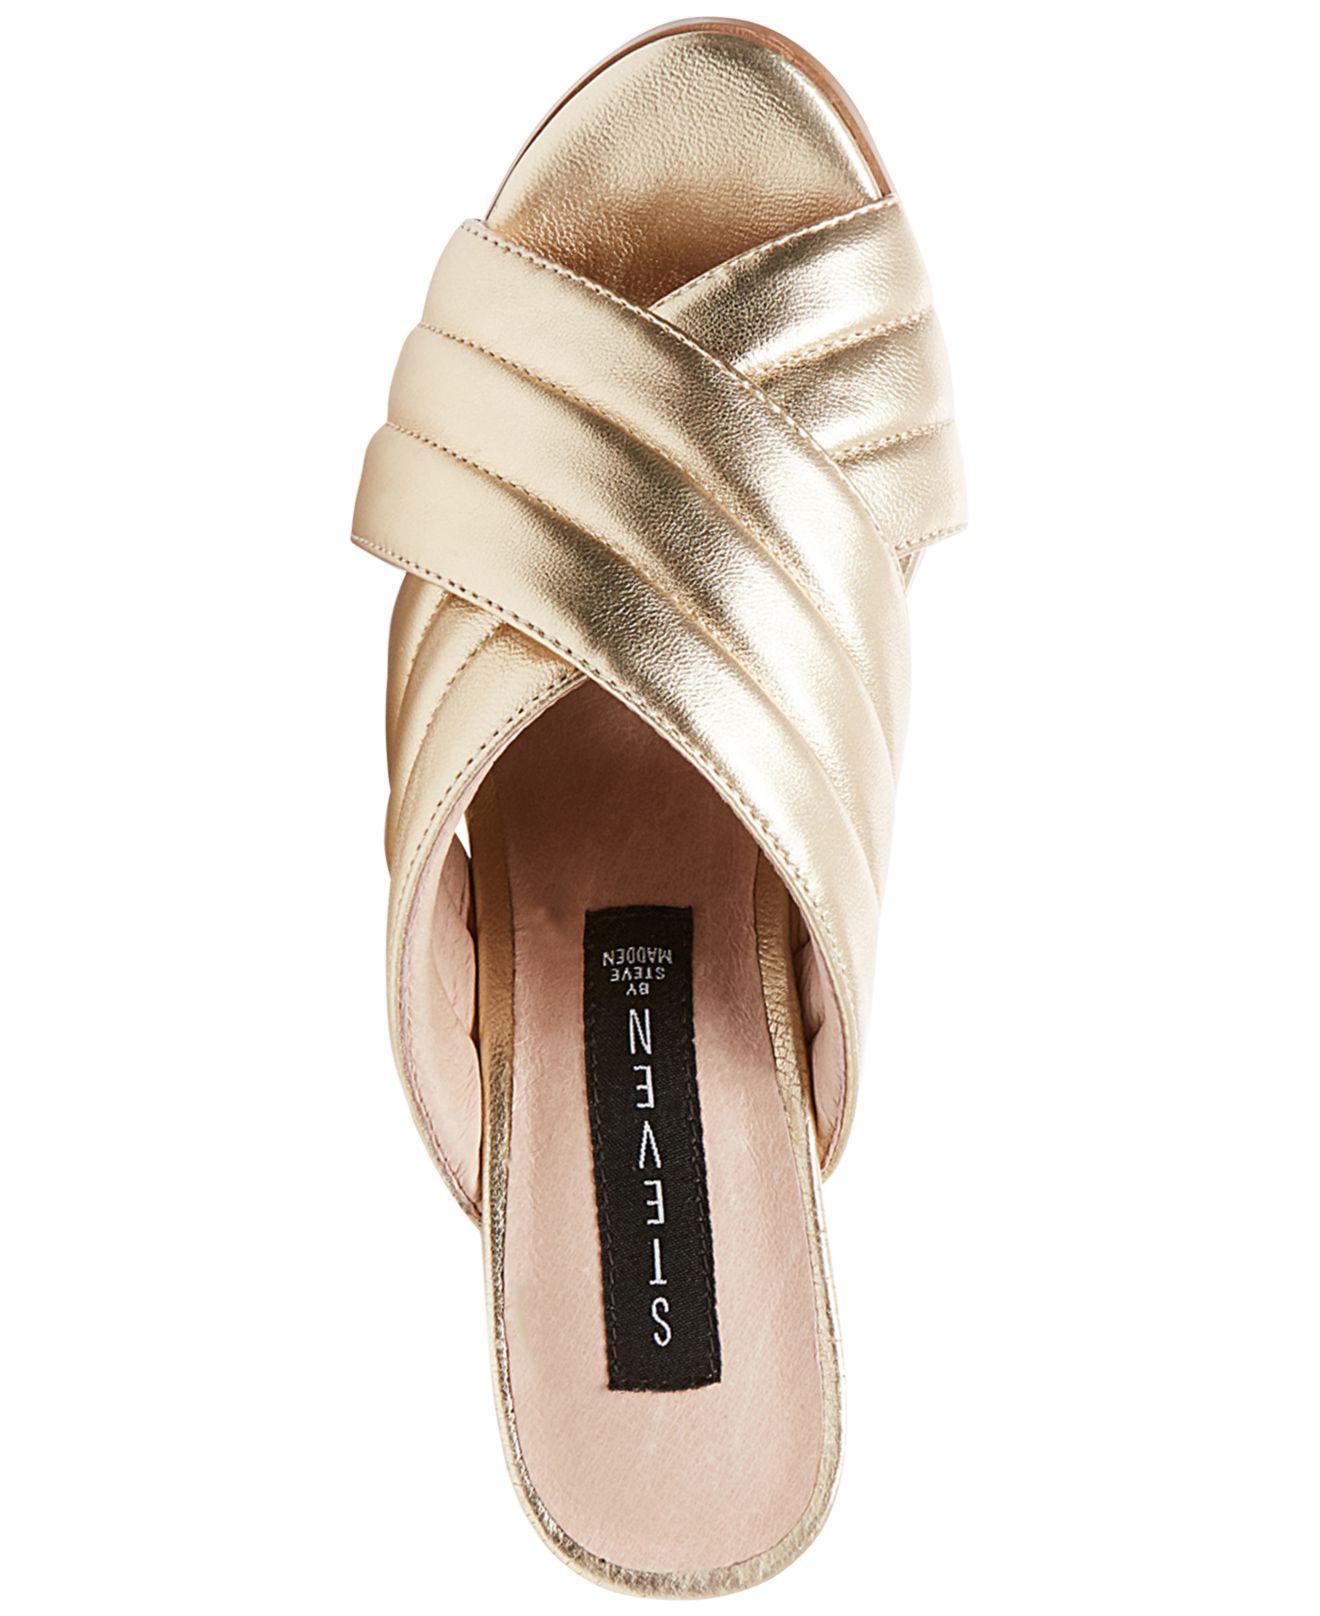 d6308bf5c91 Lyst - Steven by Steve Madden Women s Zada Slide-on Block-heel Sandals